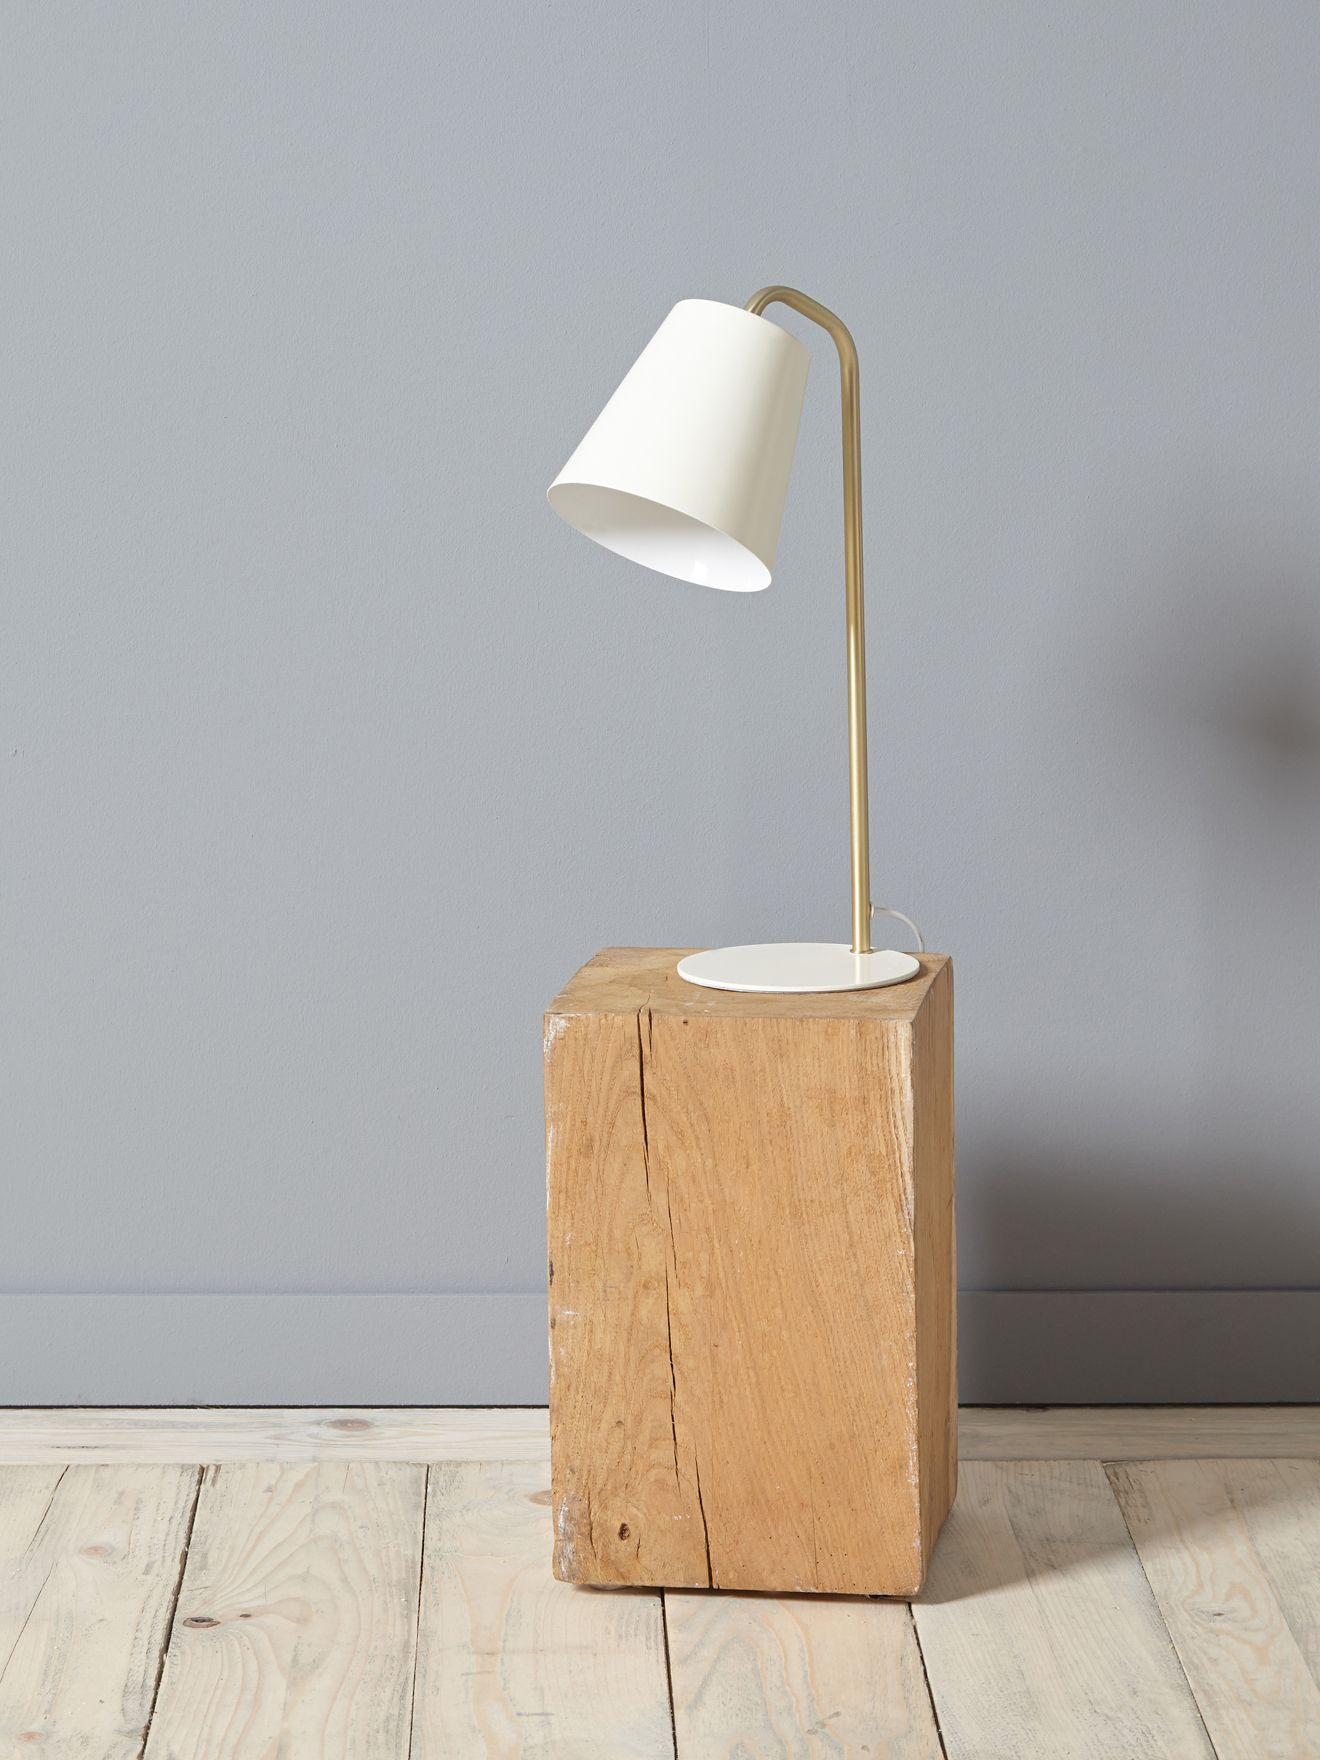 49f614648e7879156528373e85dd57fe Résultat Supérieur 60 Beau Lampe Cloche Galerie 2018 Hdj5